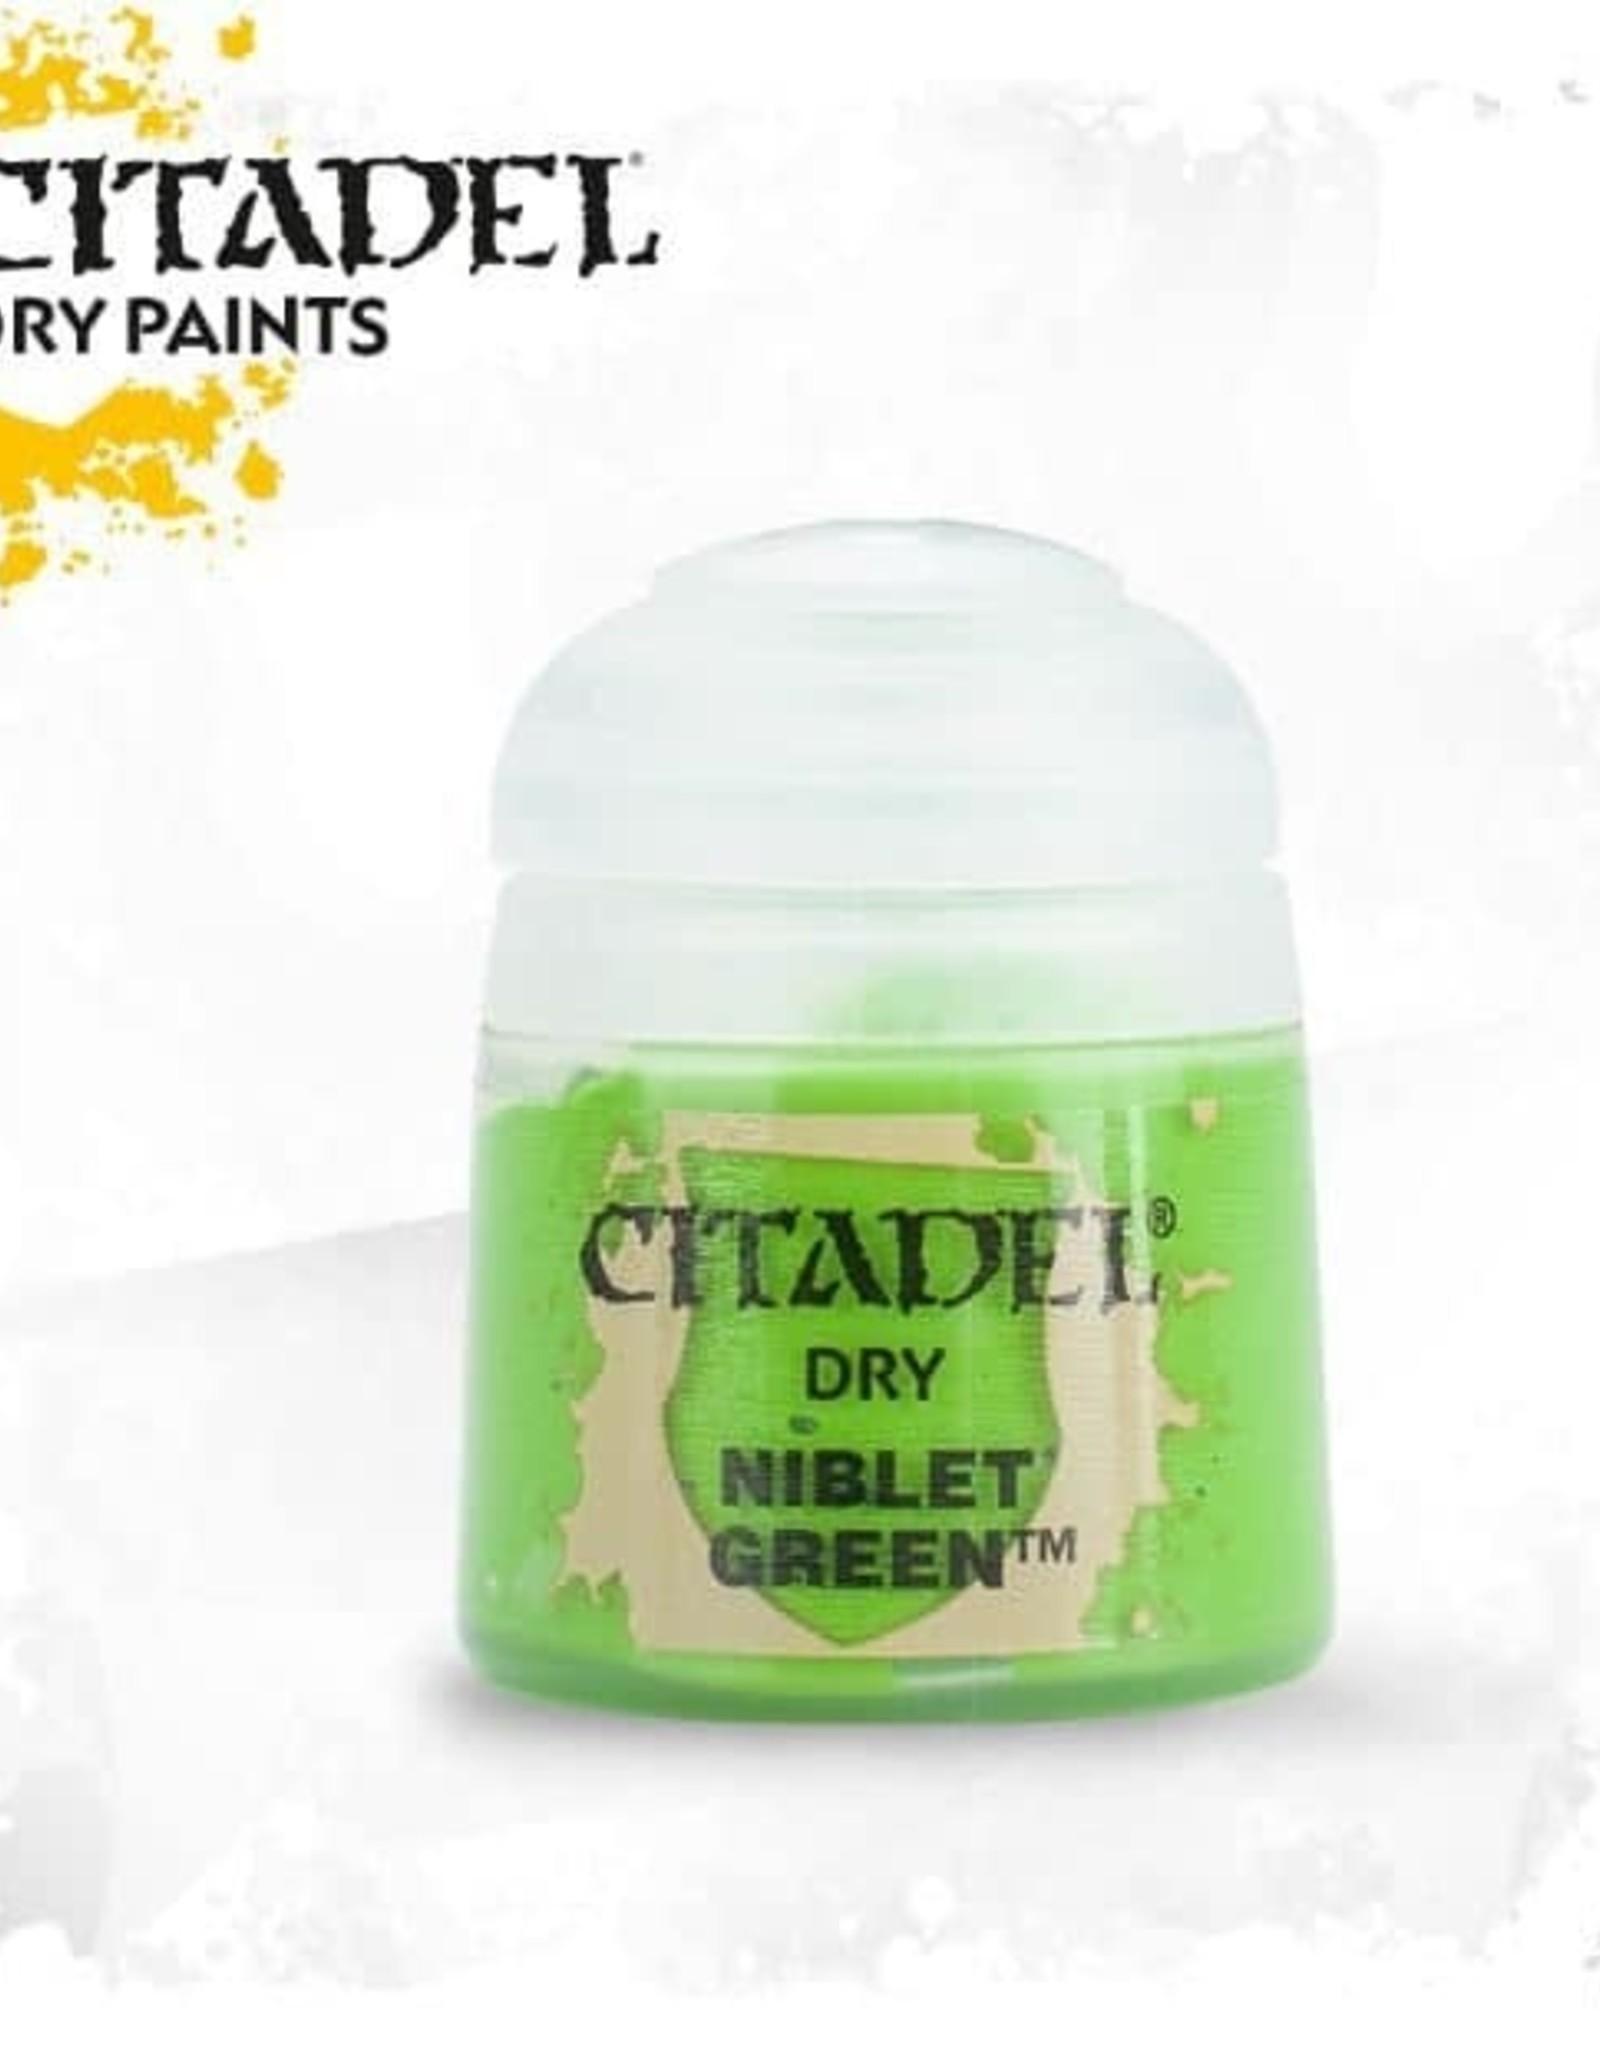 Games Workshop Citadel Paint: Dry - Niblet Green